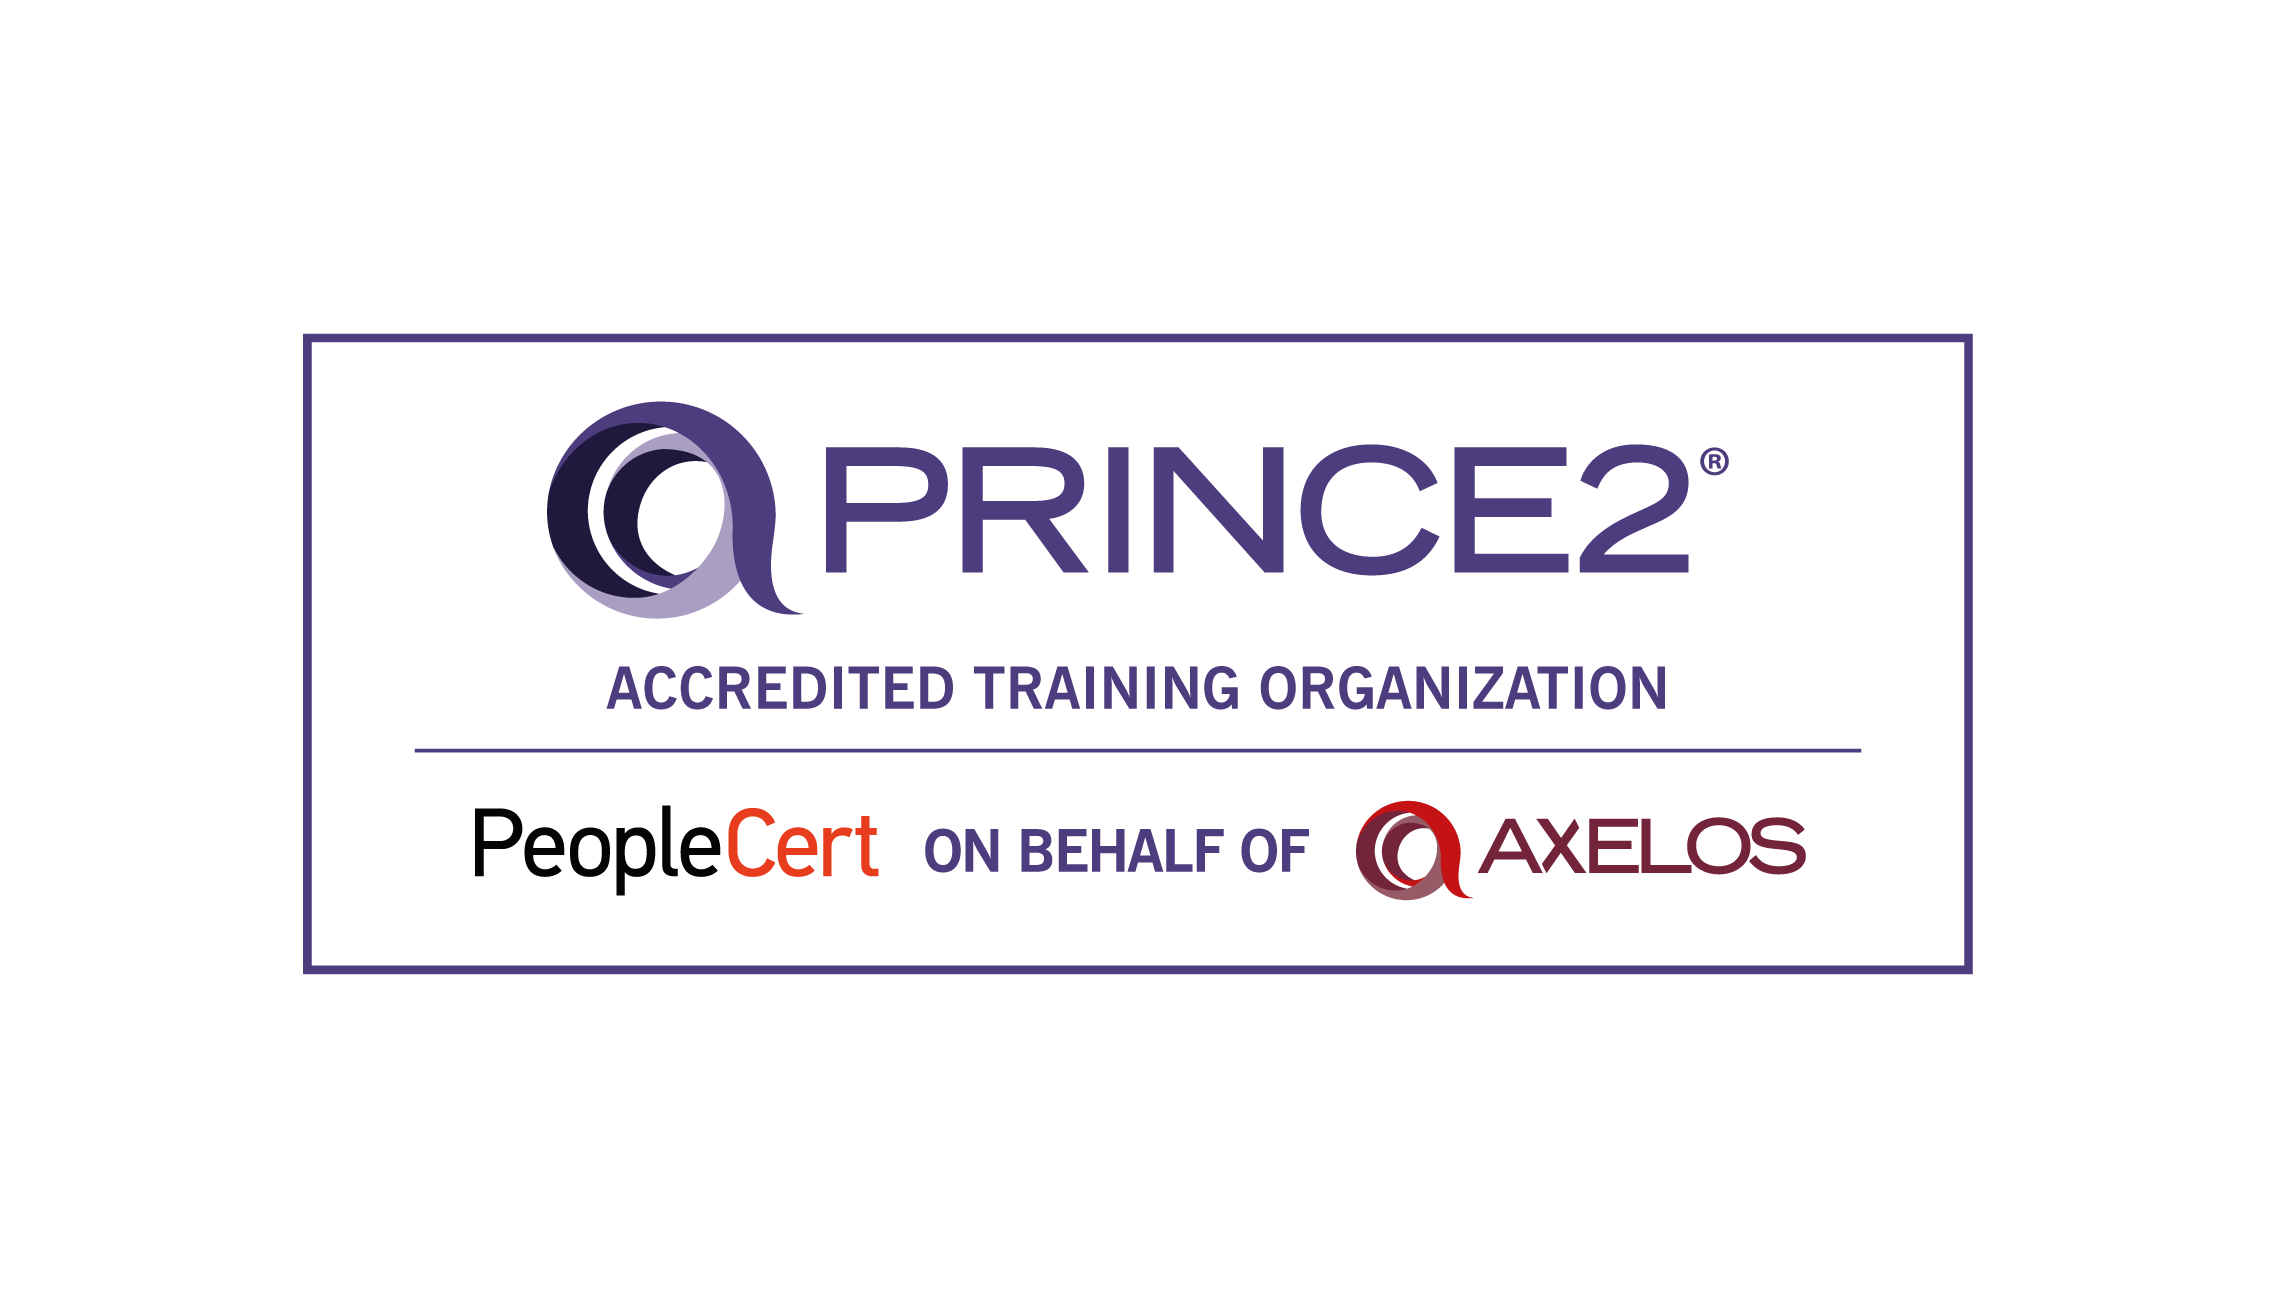 PRINCE2® & PRINCE2 Agile® | CC Learning